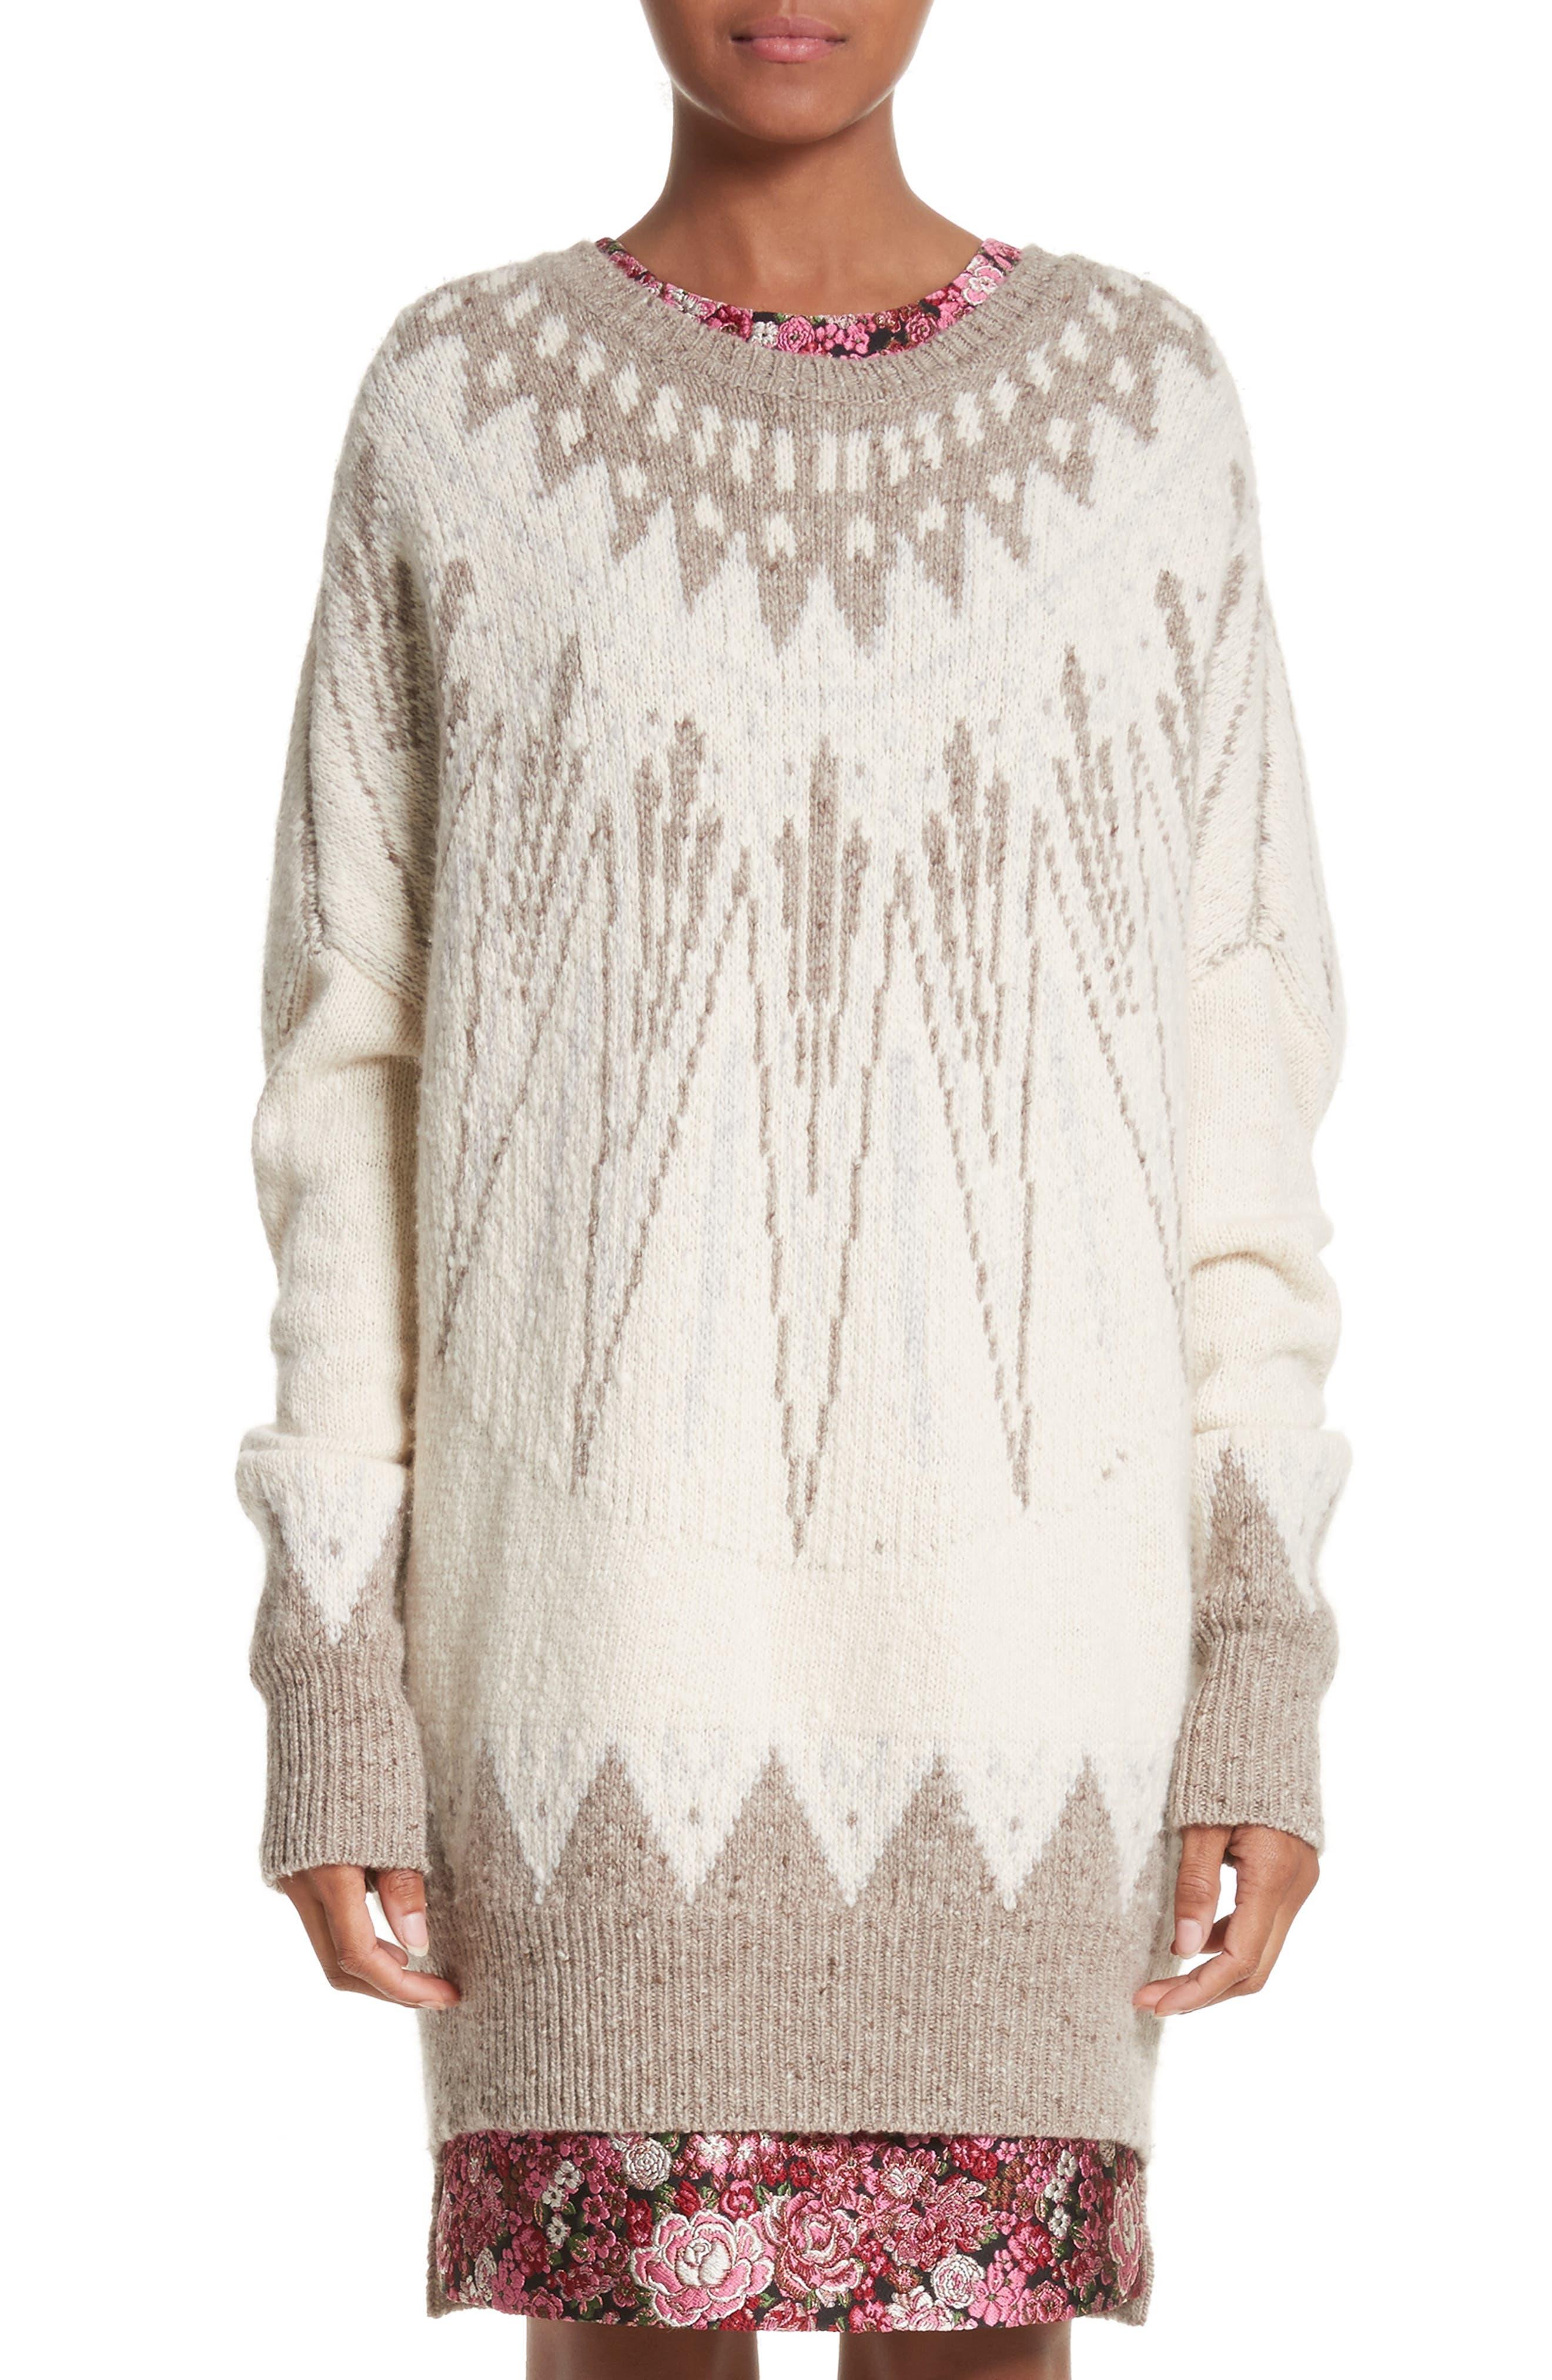 Main Image - Adam Lippes Marled Merino Wool & Cashmere Fair Isle Sweater